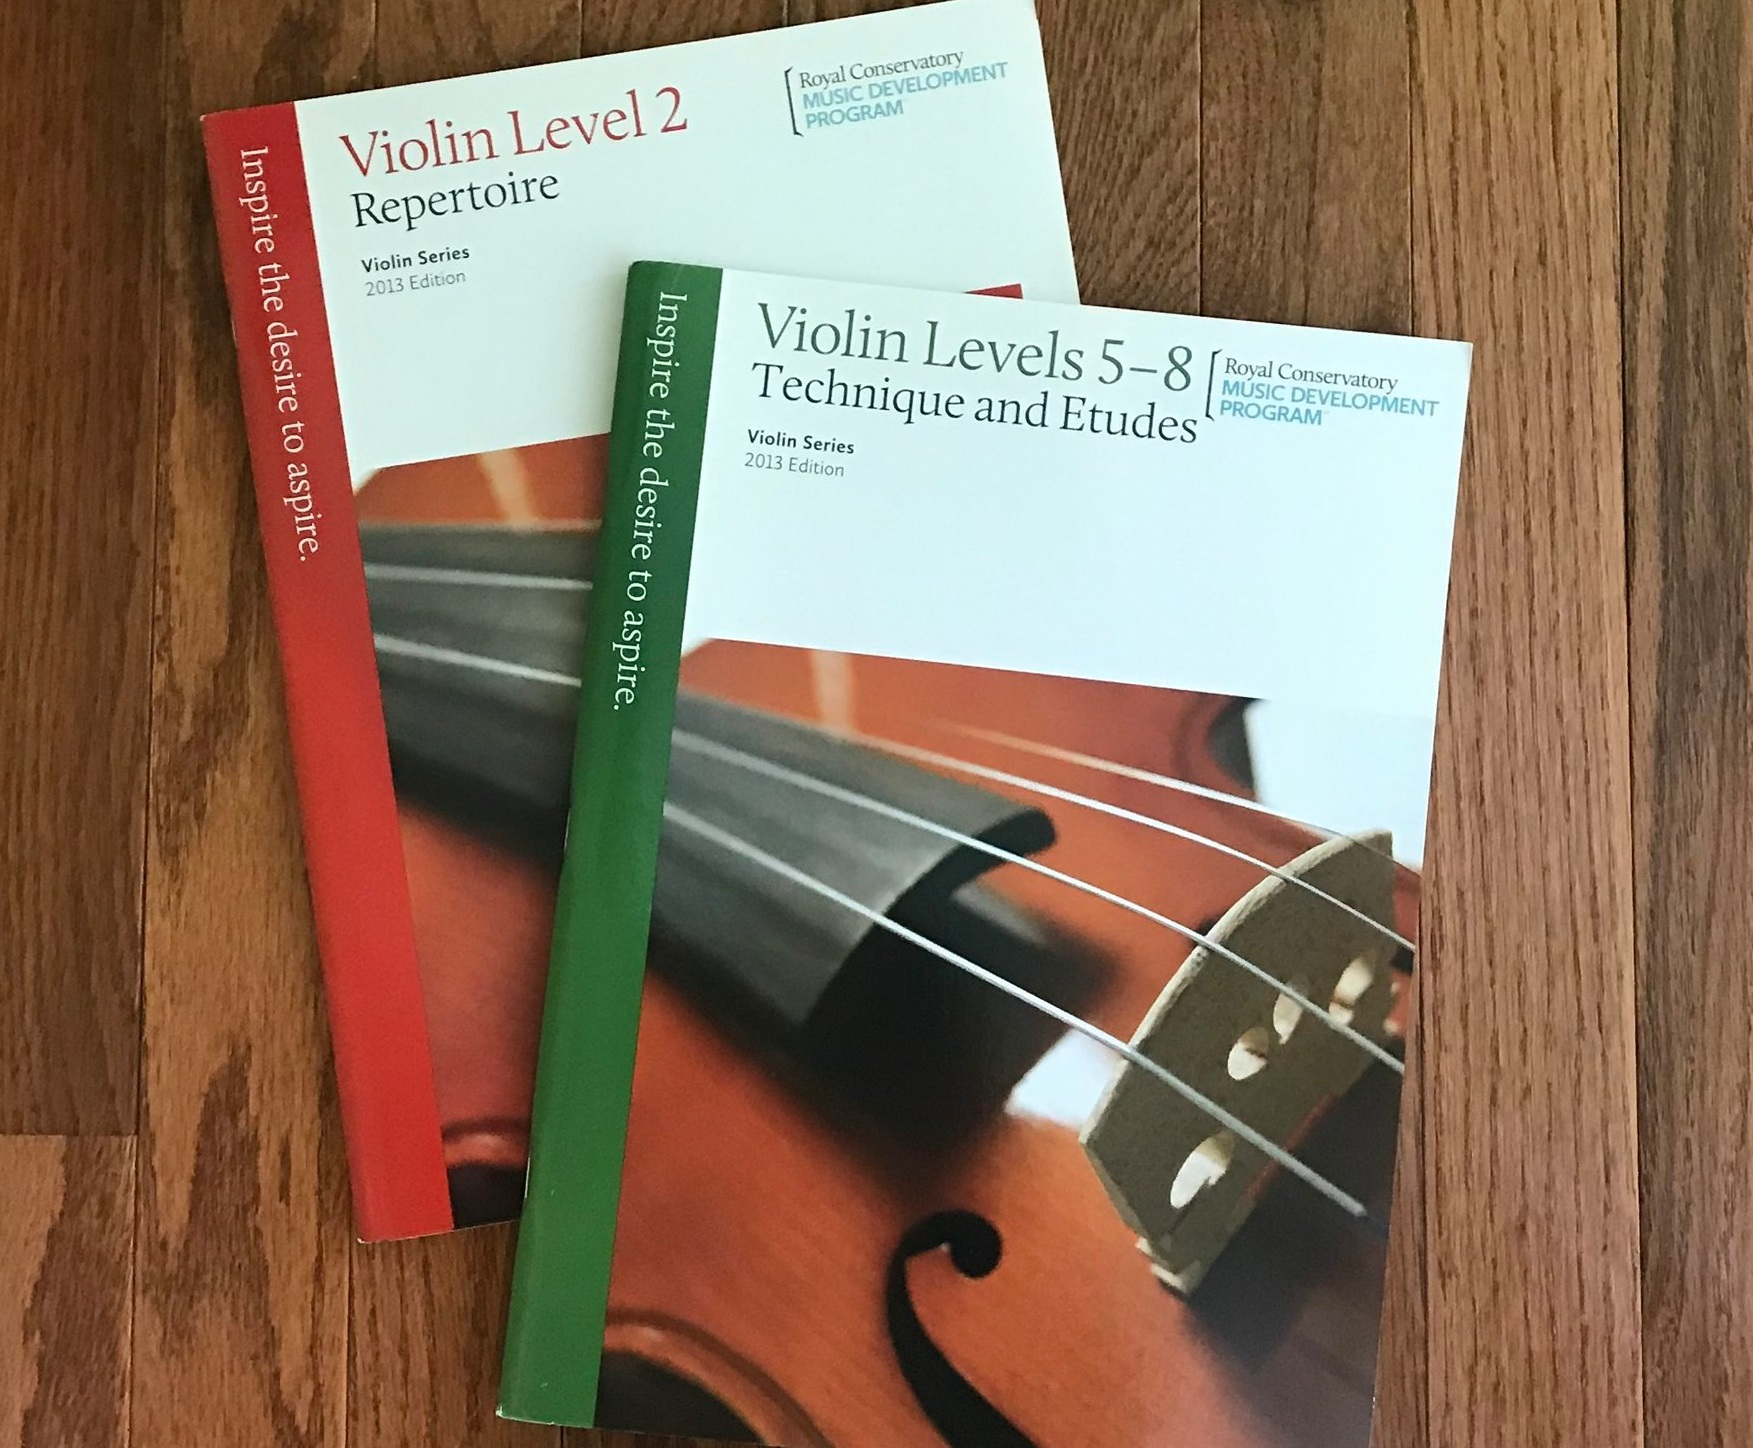 Example of Repertoire and Technique books